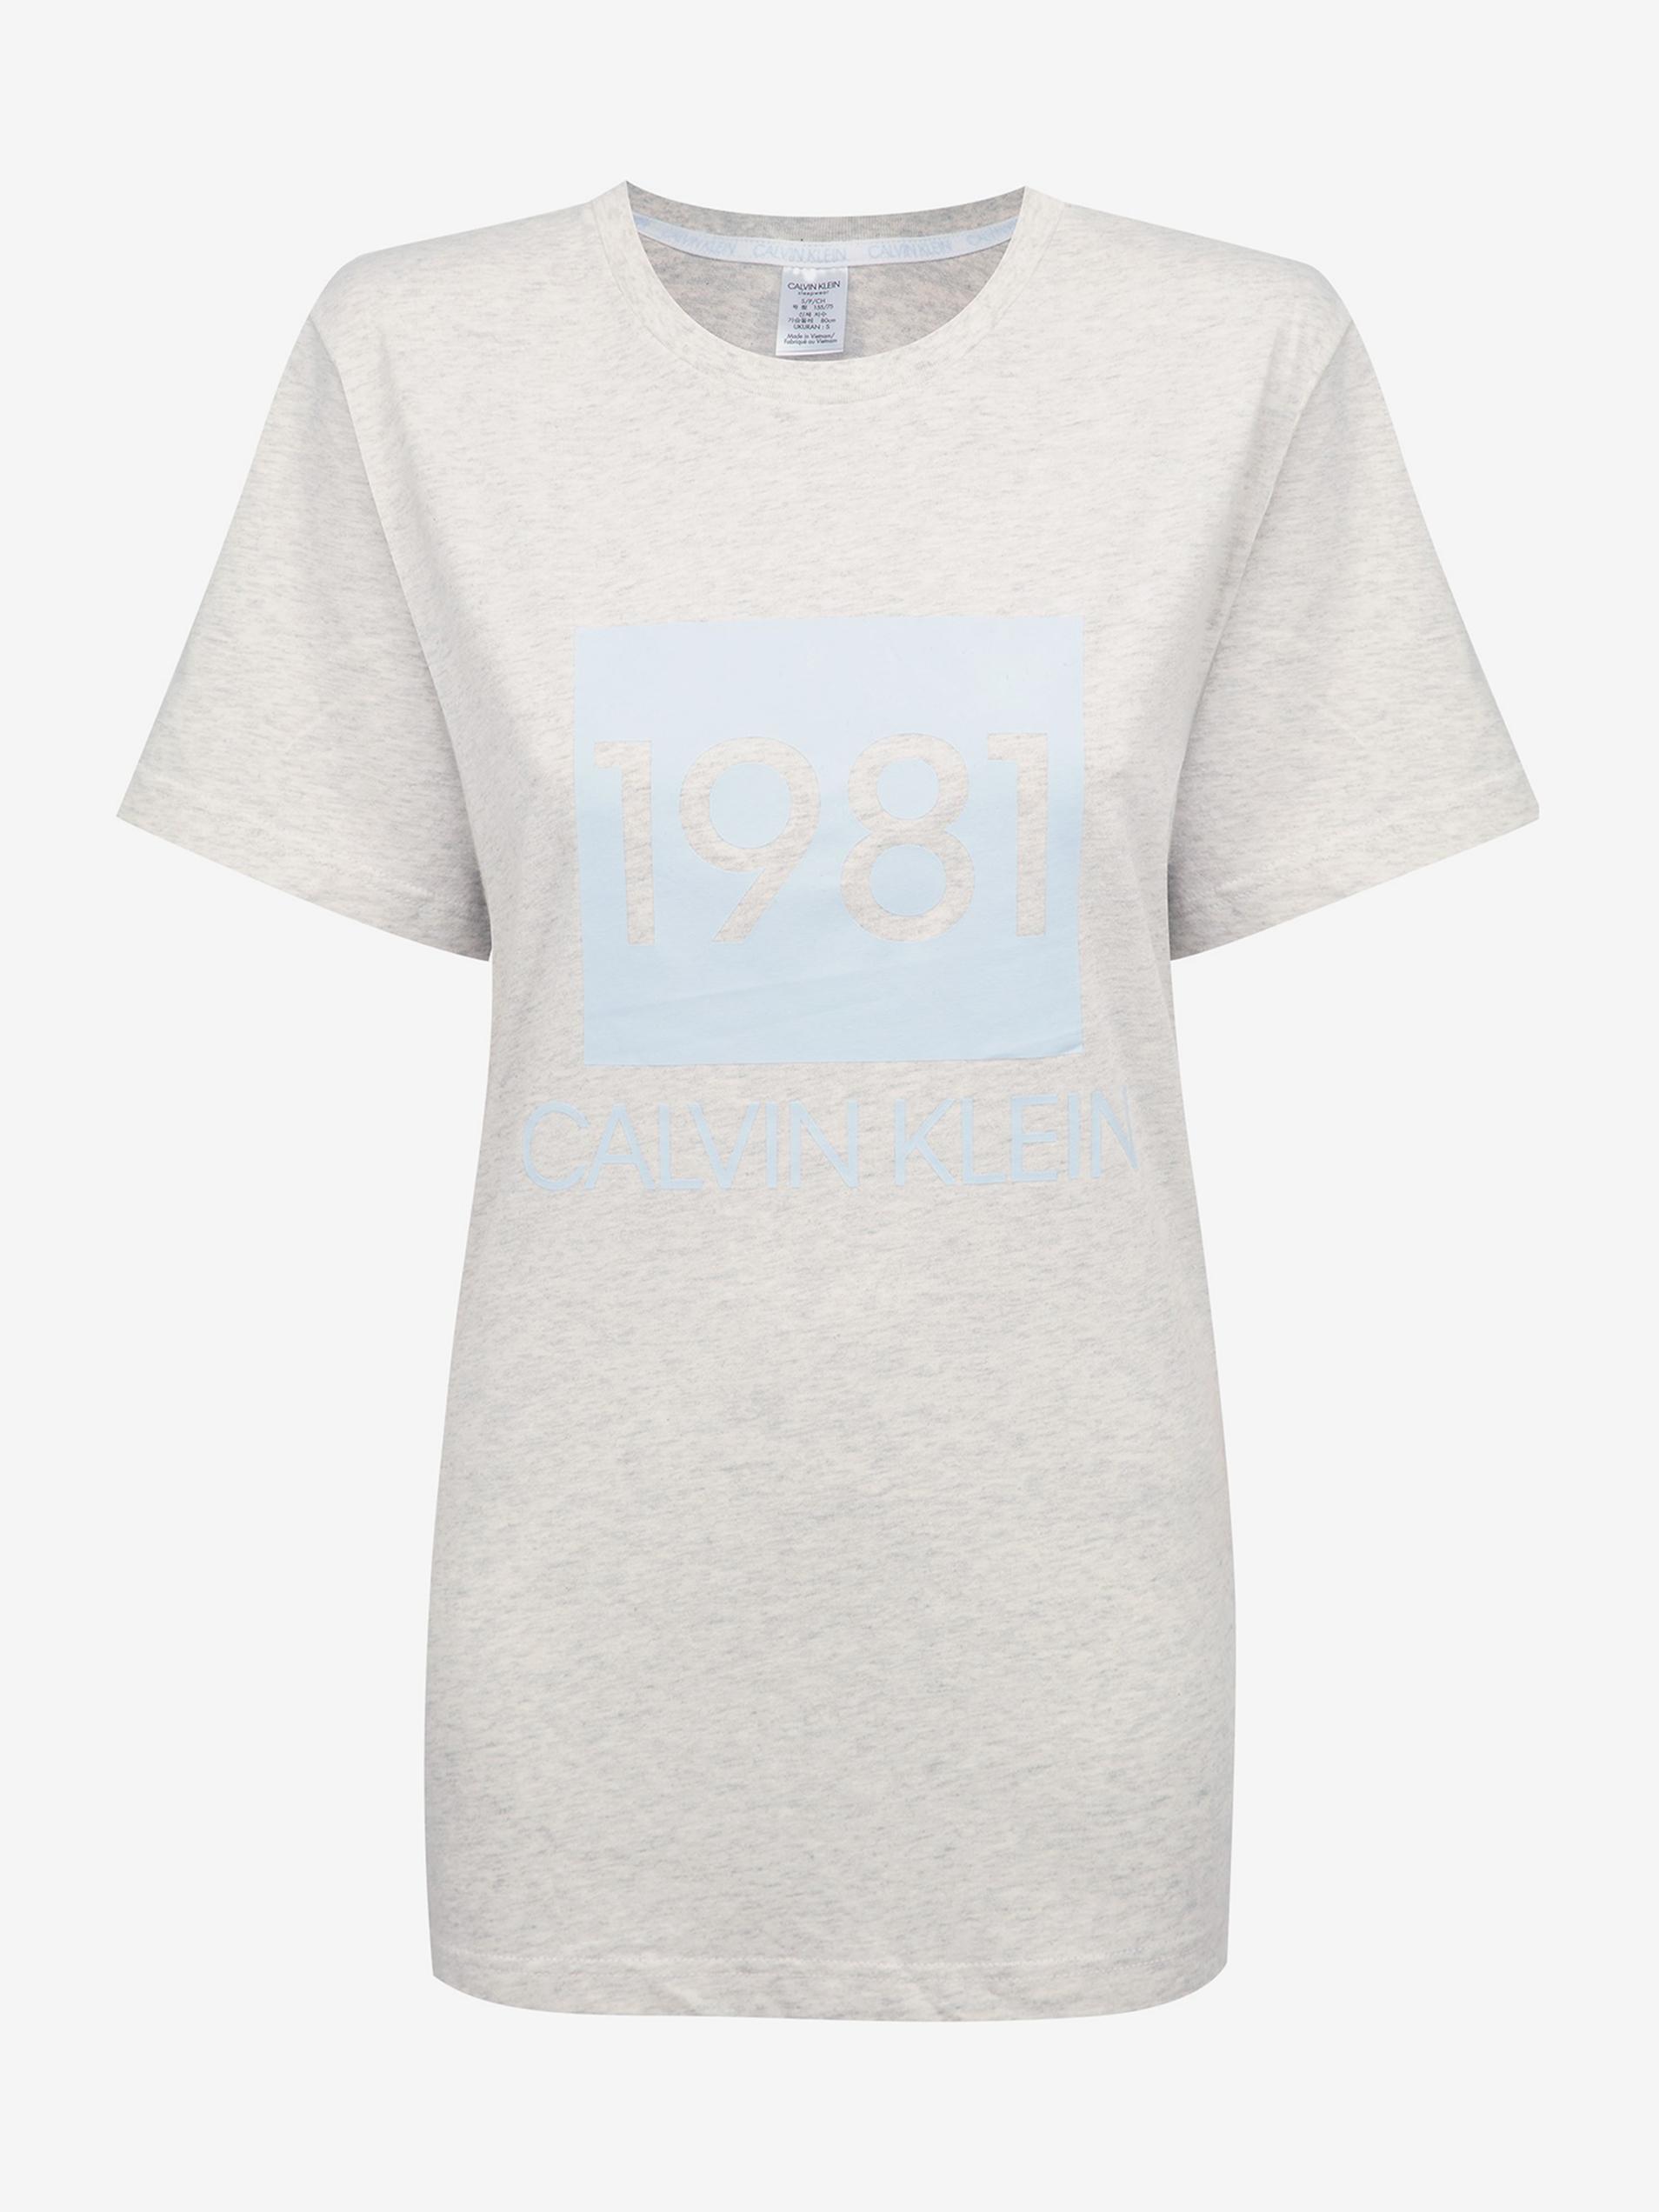 Calvin Klein tricou gri de dama S/S Crew Neck cu logo 1981